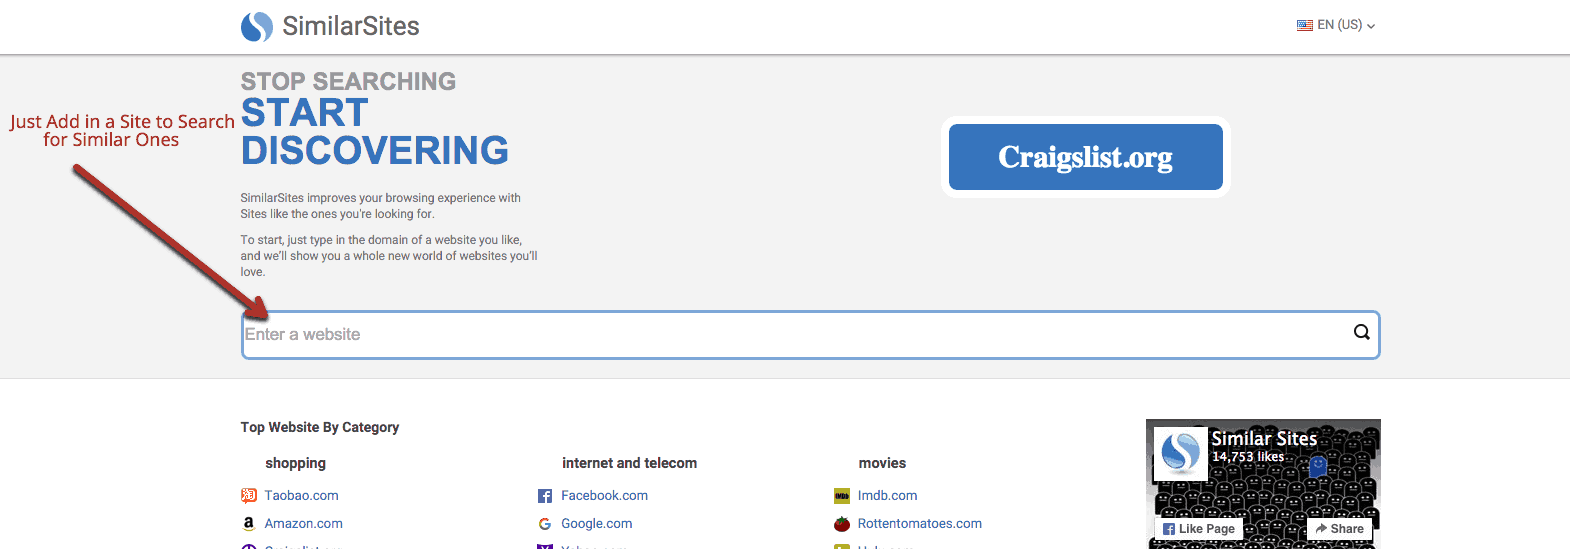 Similiarsites.com for SEO Company research